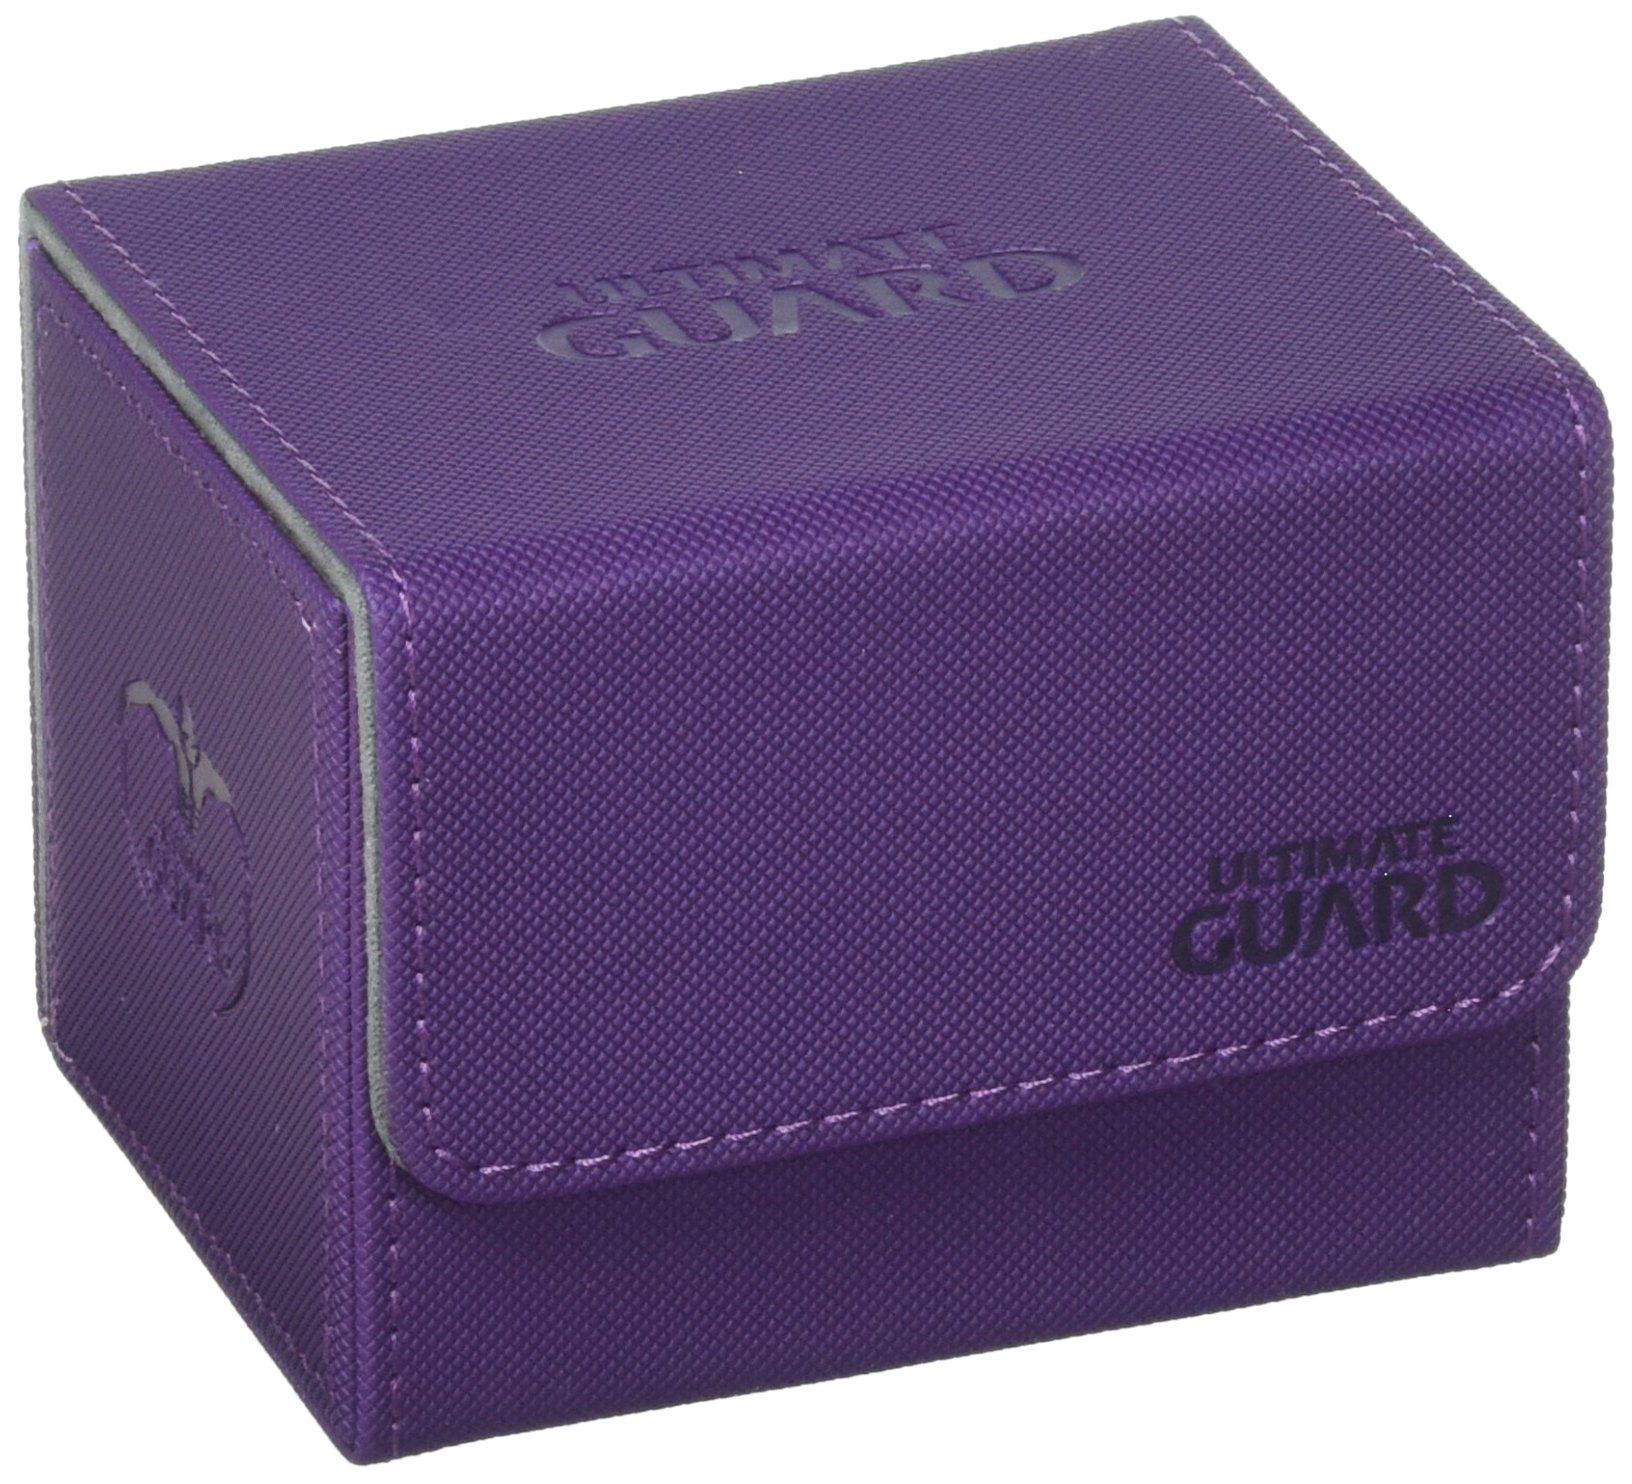 Ultimate Guard Sidewinder Deck Box 100+ XenoSkin Card Game, Purple, Large by Ultimate Guard